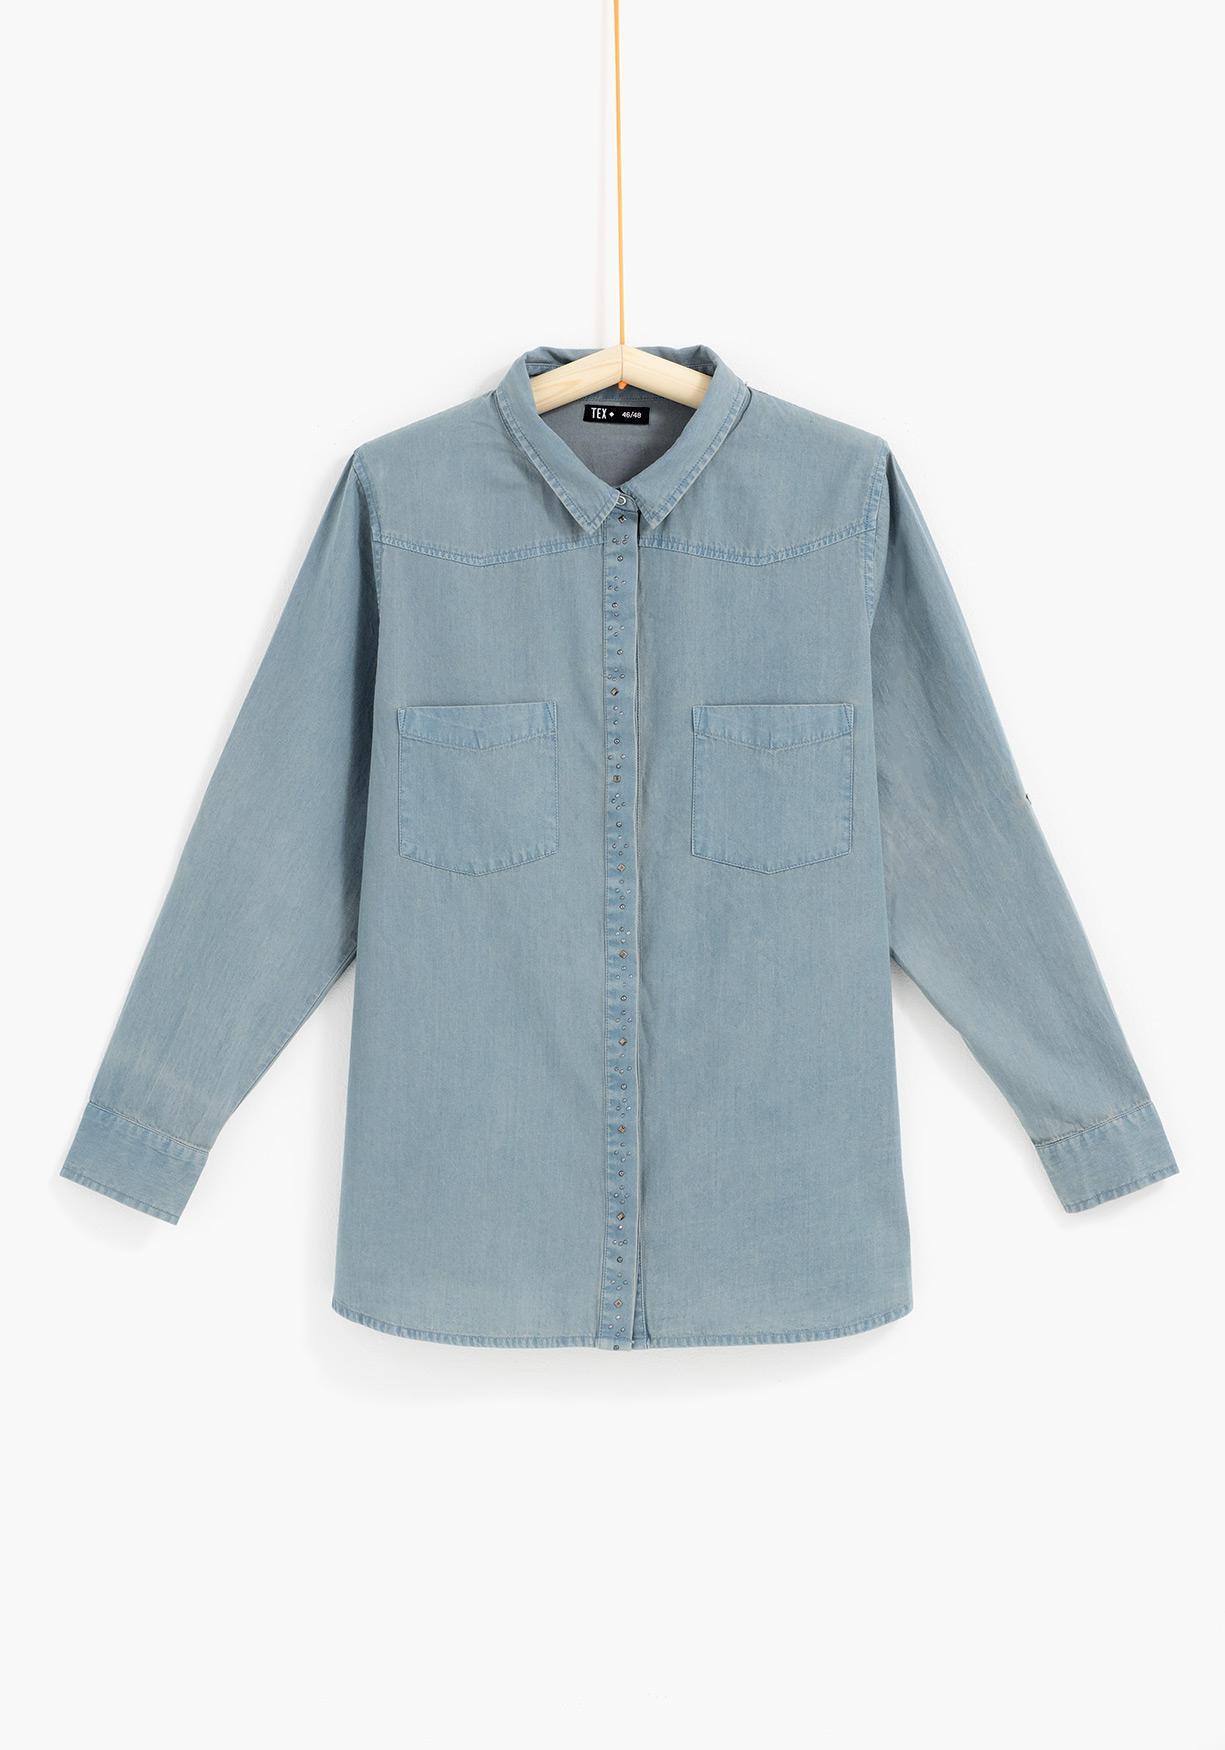 0acc756bc7 Comprar Camisa vaquera para tallas grandes TEX. ¡Aprovéchate de ...